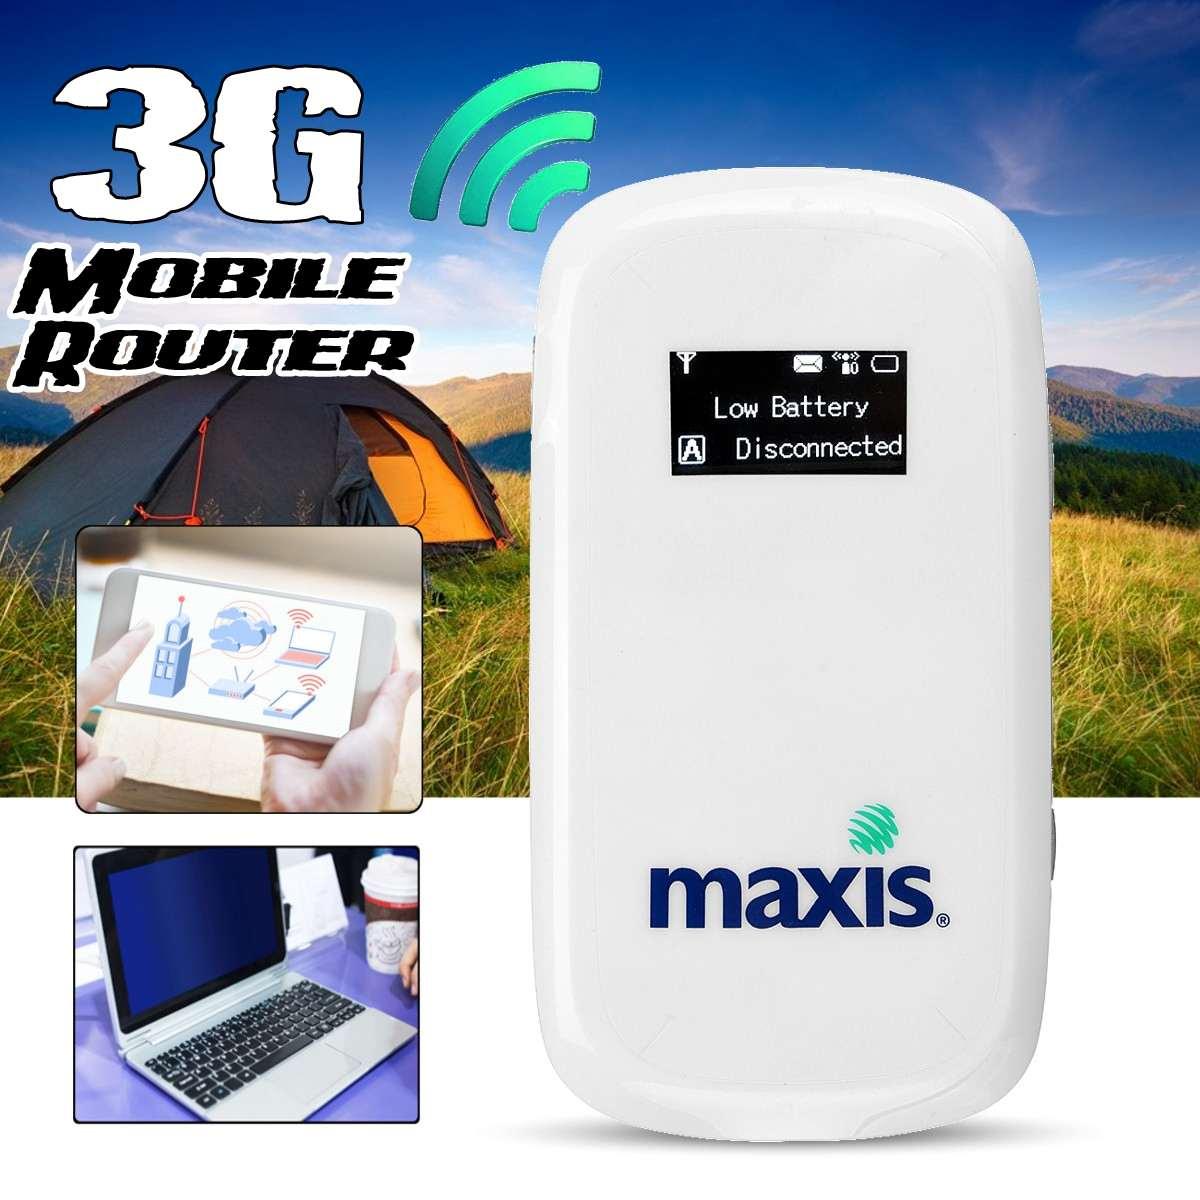 UNLOCKED- 3G Mobile Broadband Modem Wifi Router Mifi SIM Card Wireless HotspotUNLOCKED- 3G Mobile Broadband Modem Wifi Router Mifi SIM Card Wireless Hotspot